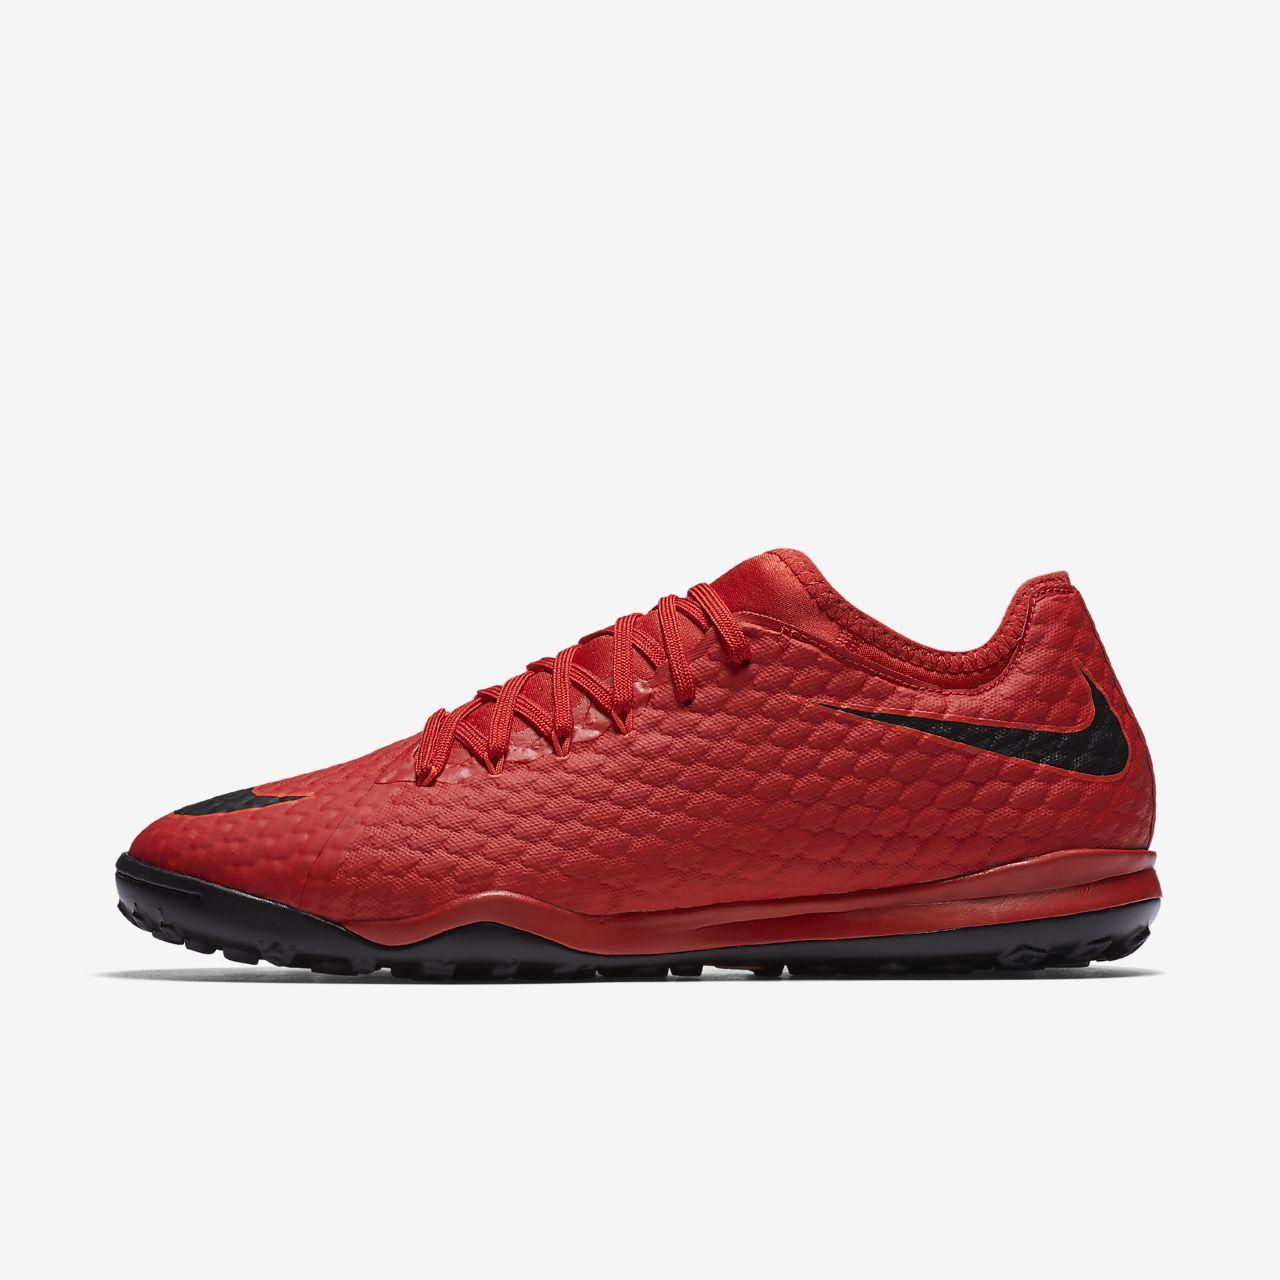 huge discount 911c5 3fb6e ... buy black color eff9f d40c8 sapatilhas de futebol para relvado nike  hypervenomx finale ii efc8a 07c98